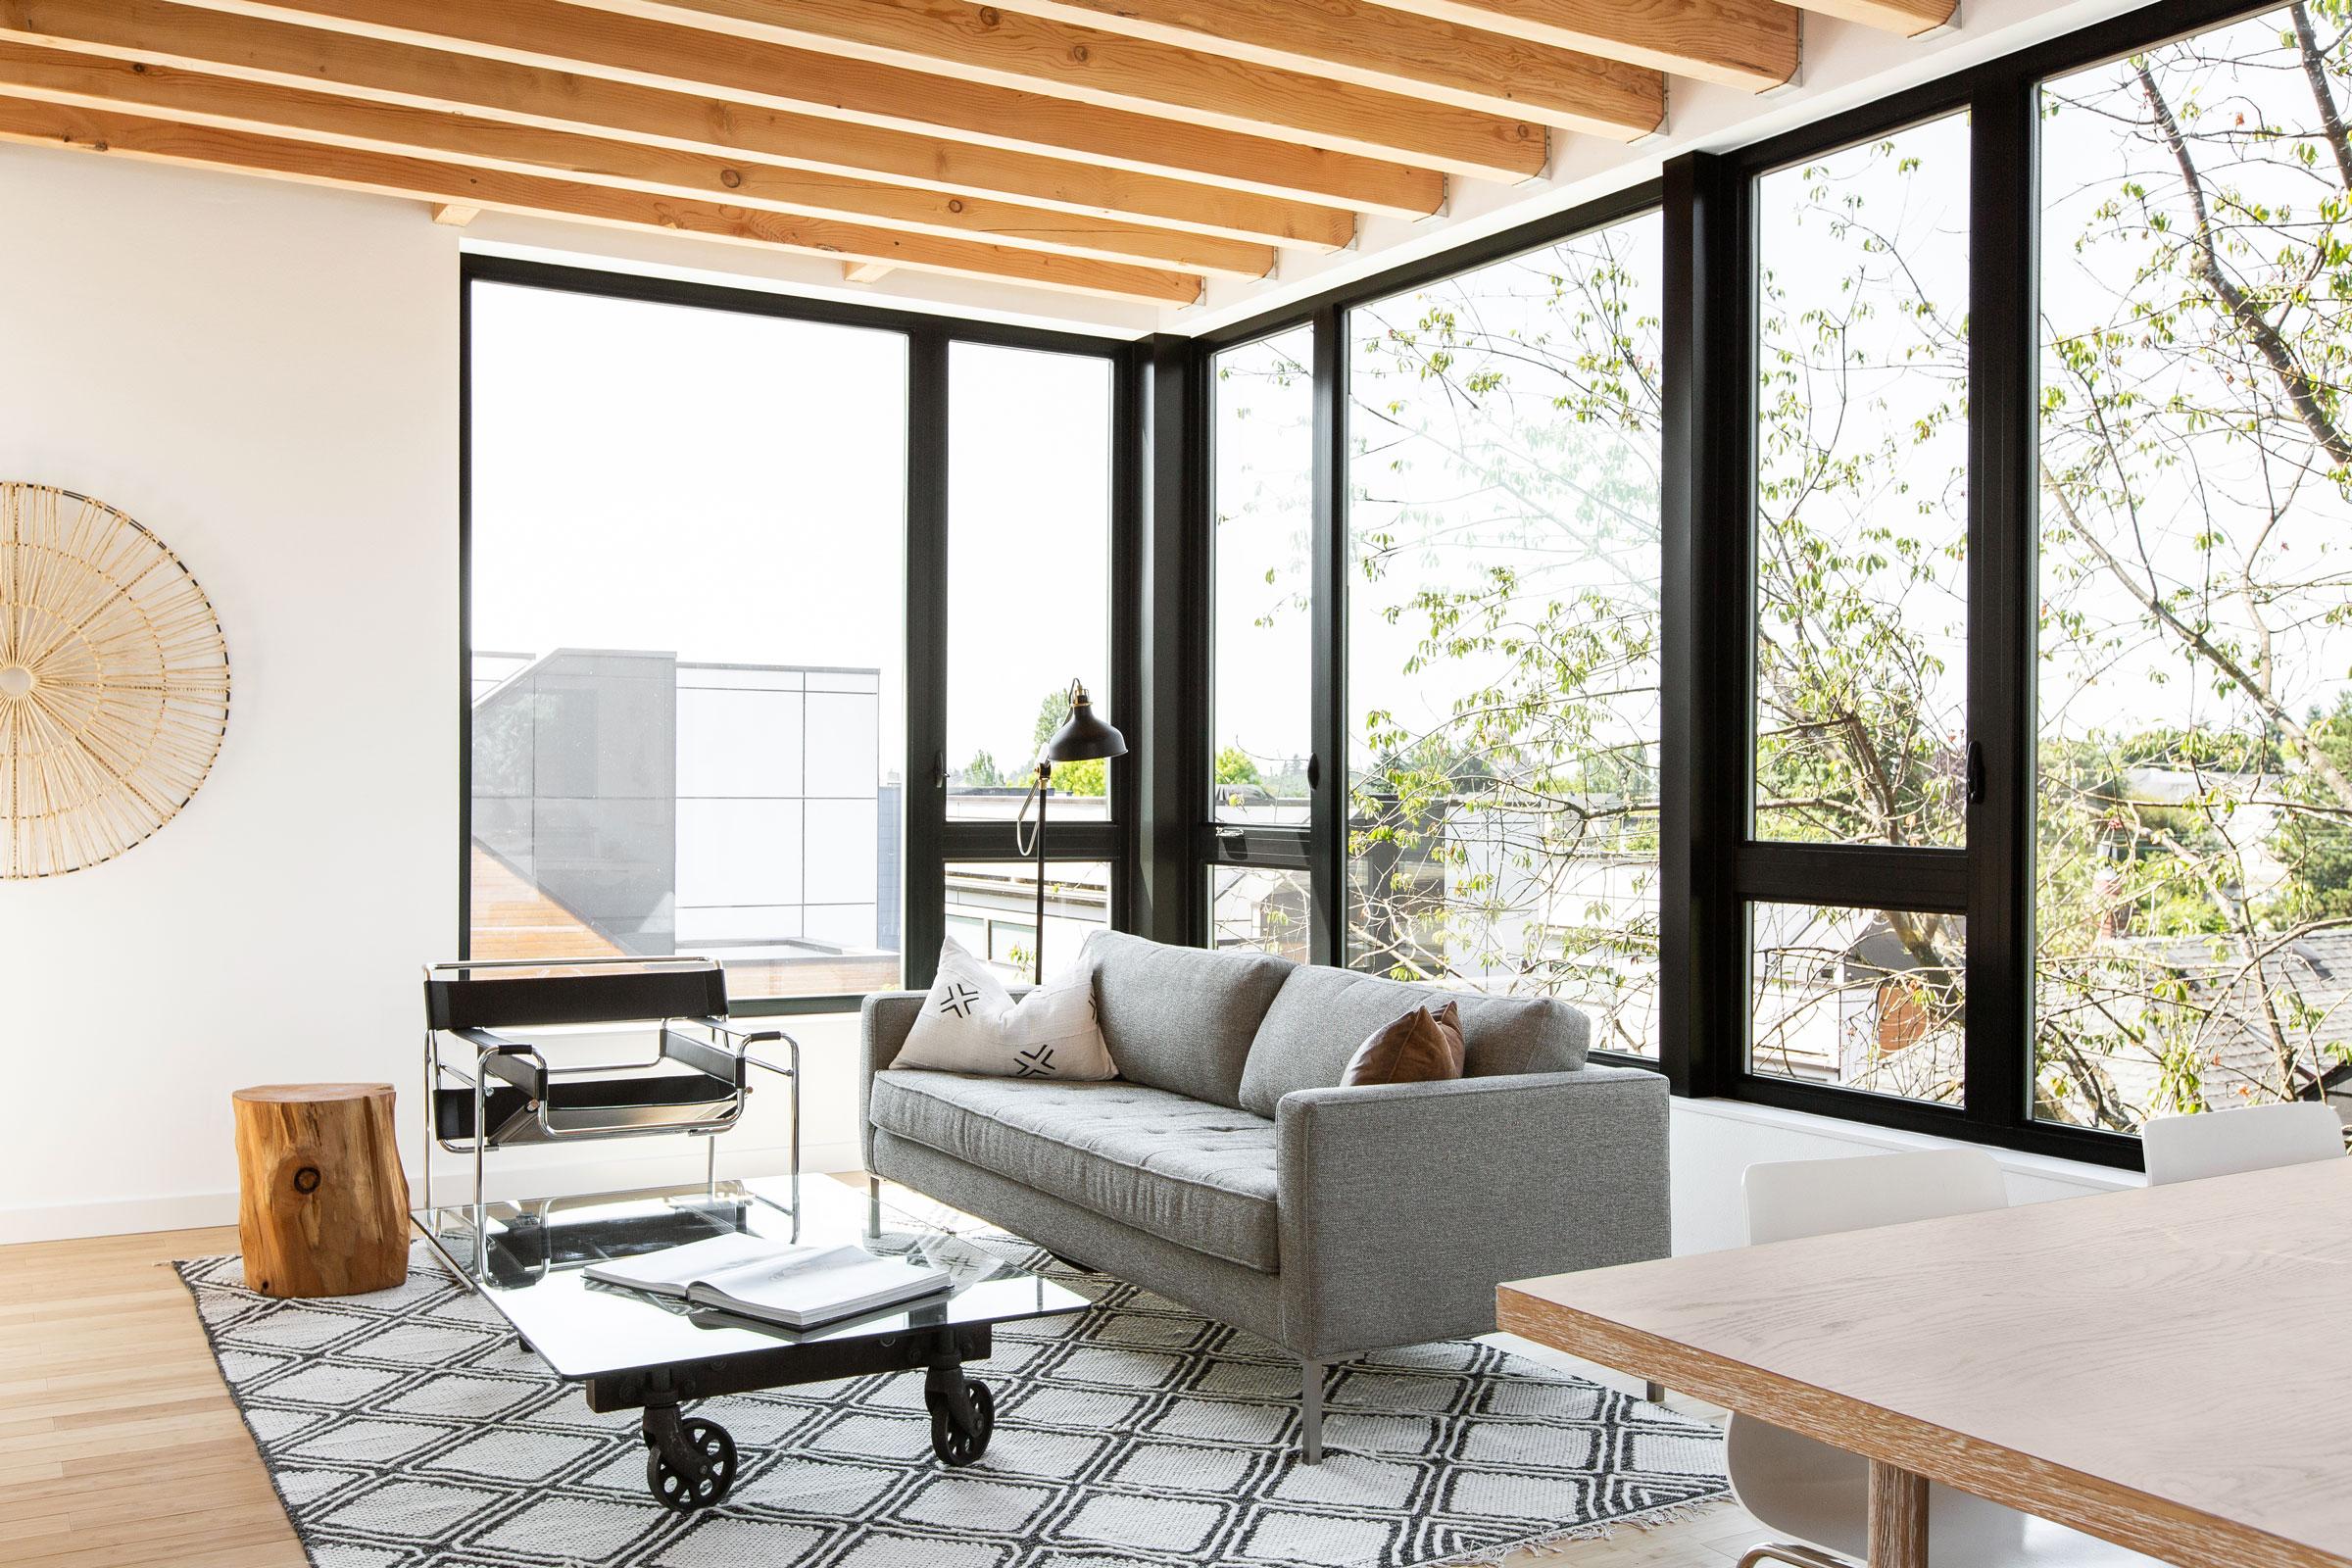 hybrid the lookout designing for density rafael soldi gbd magazine 06